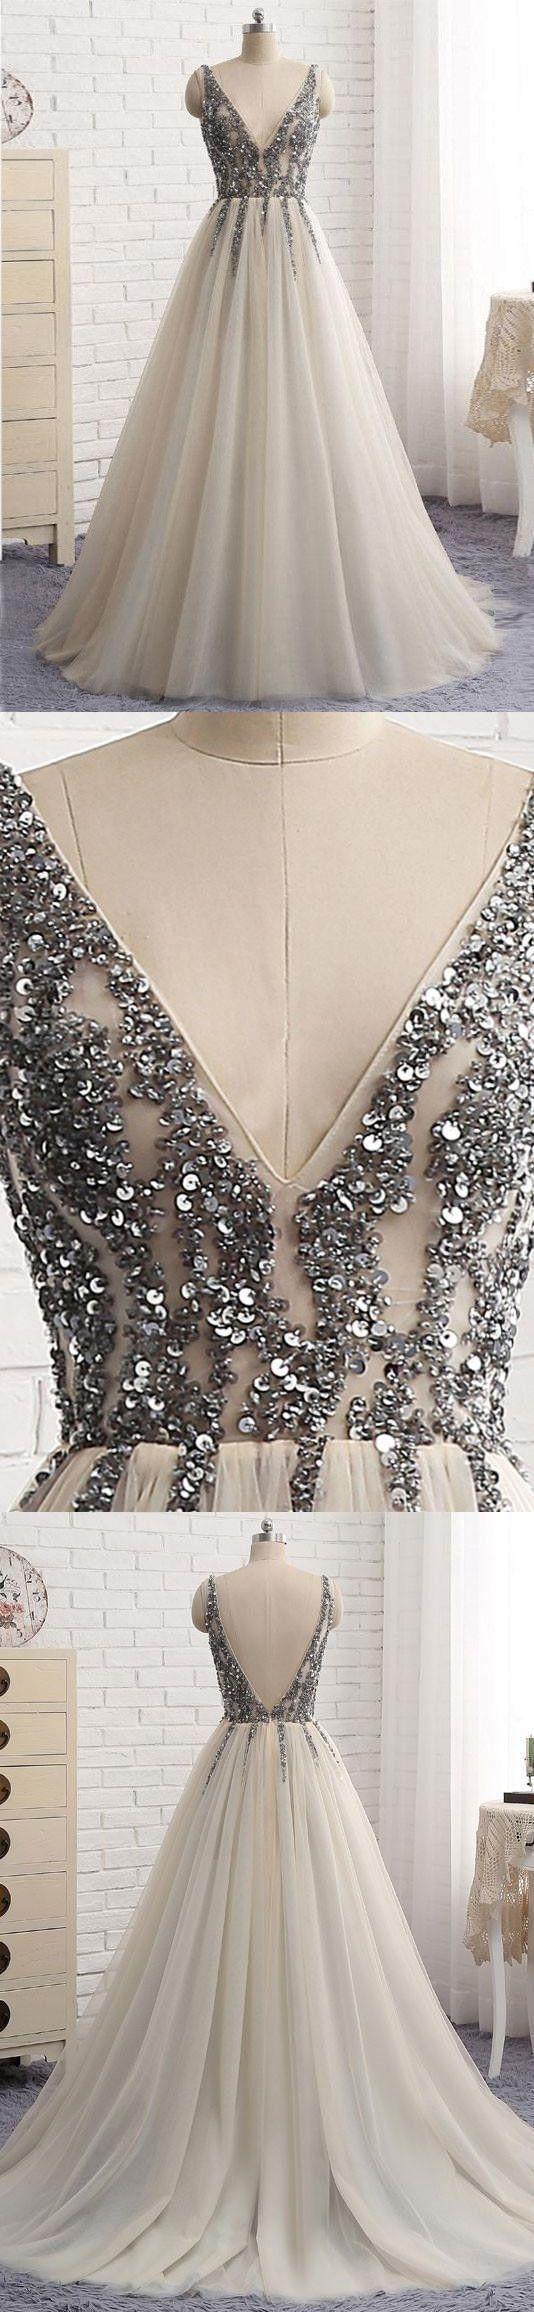 Elegant Tulle Prom Dress, Sequins Long Party Dress, V-Neck White Evening Dress